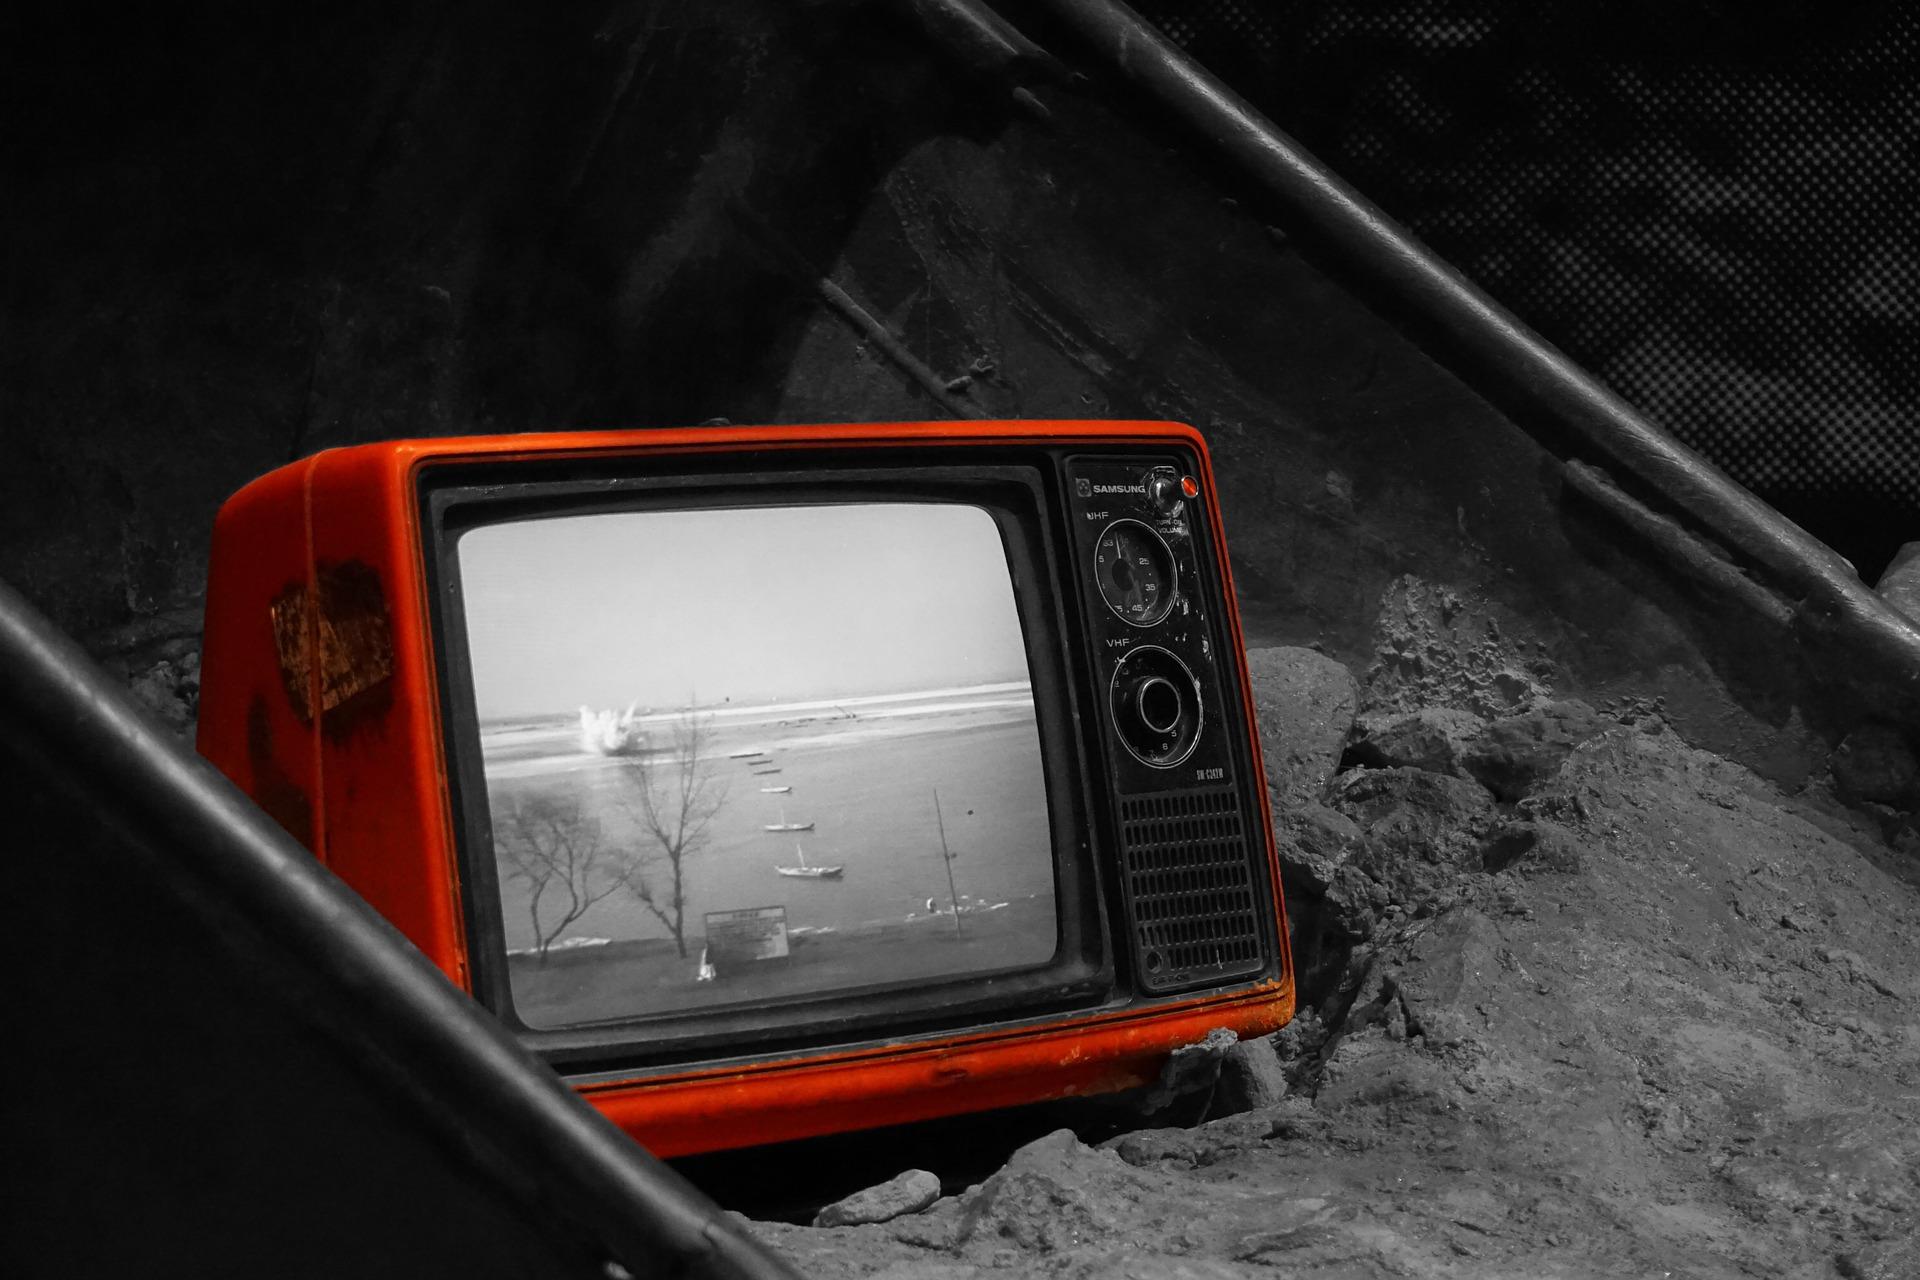 Crno beli televizot/Photo: Pixabay.com